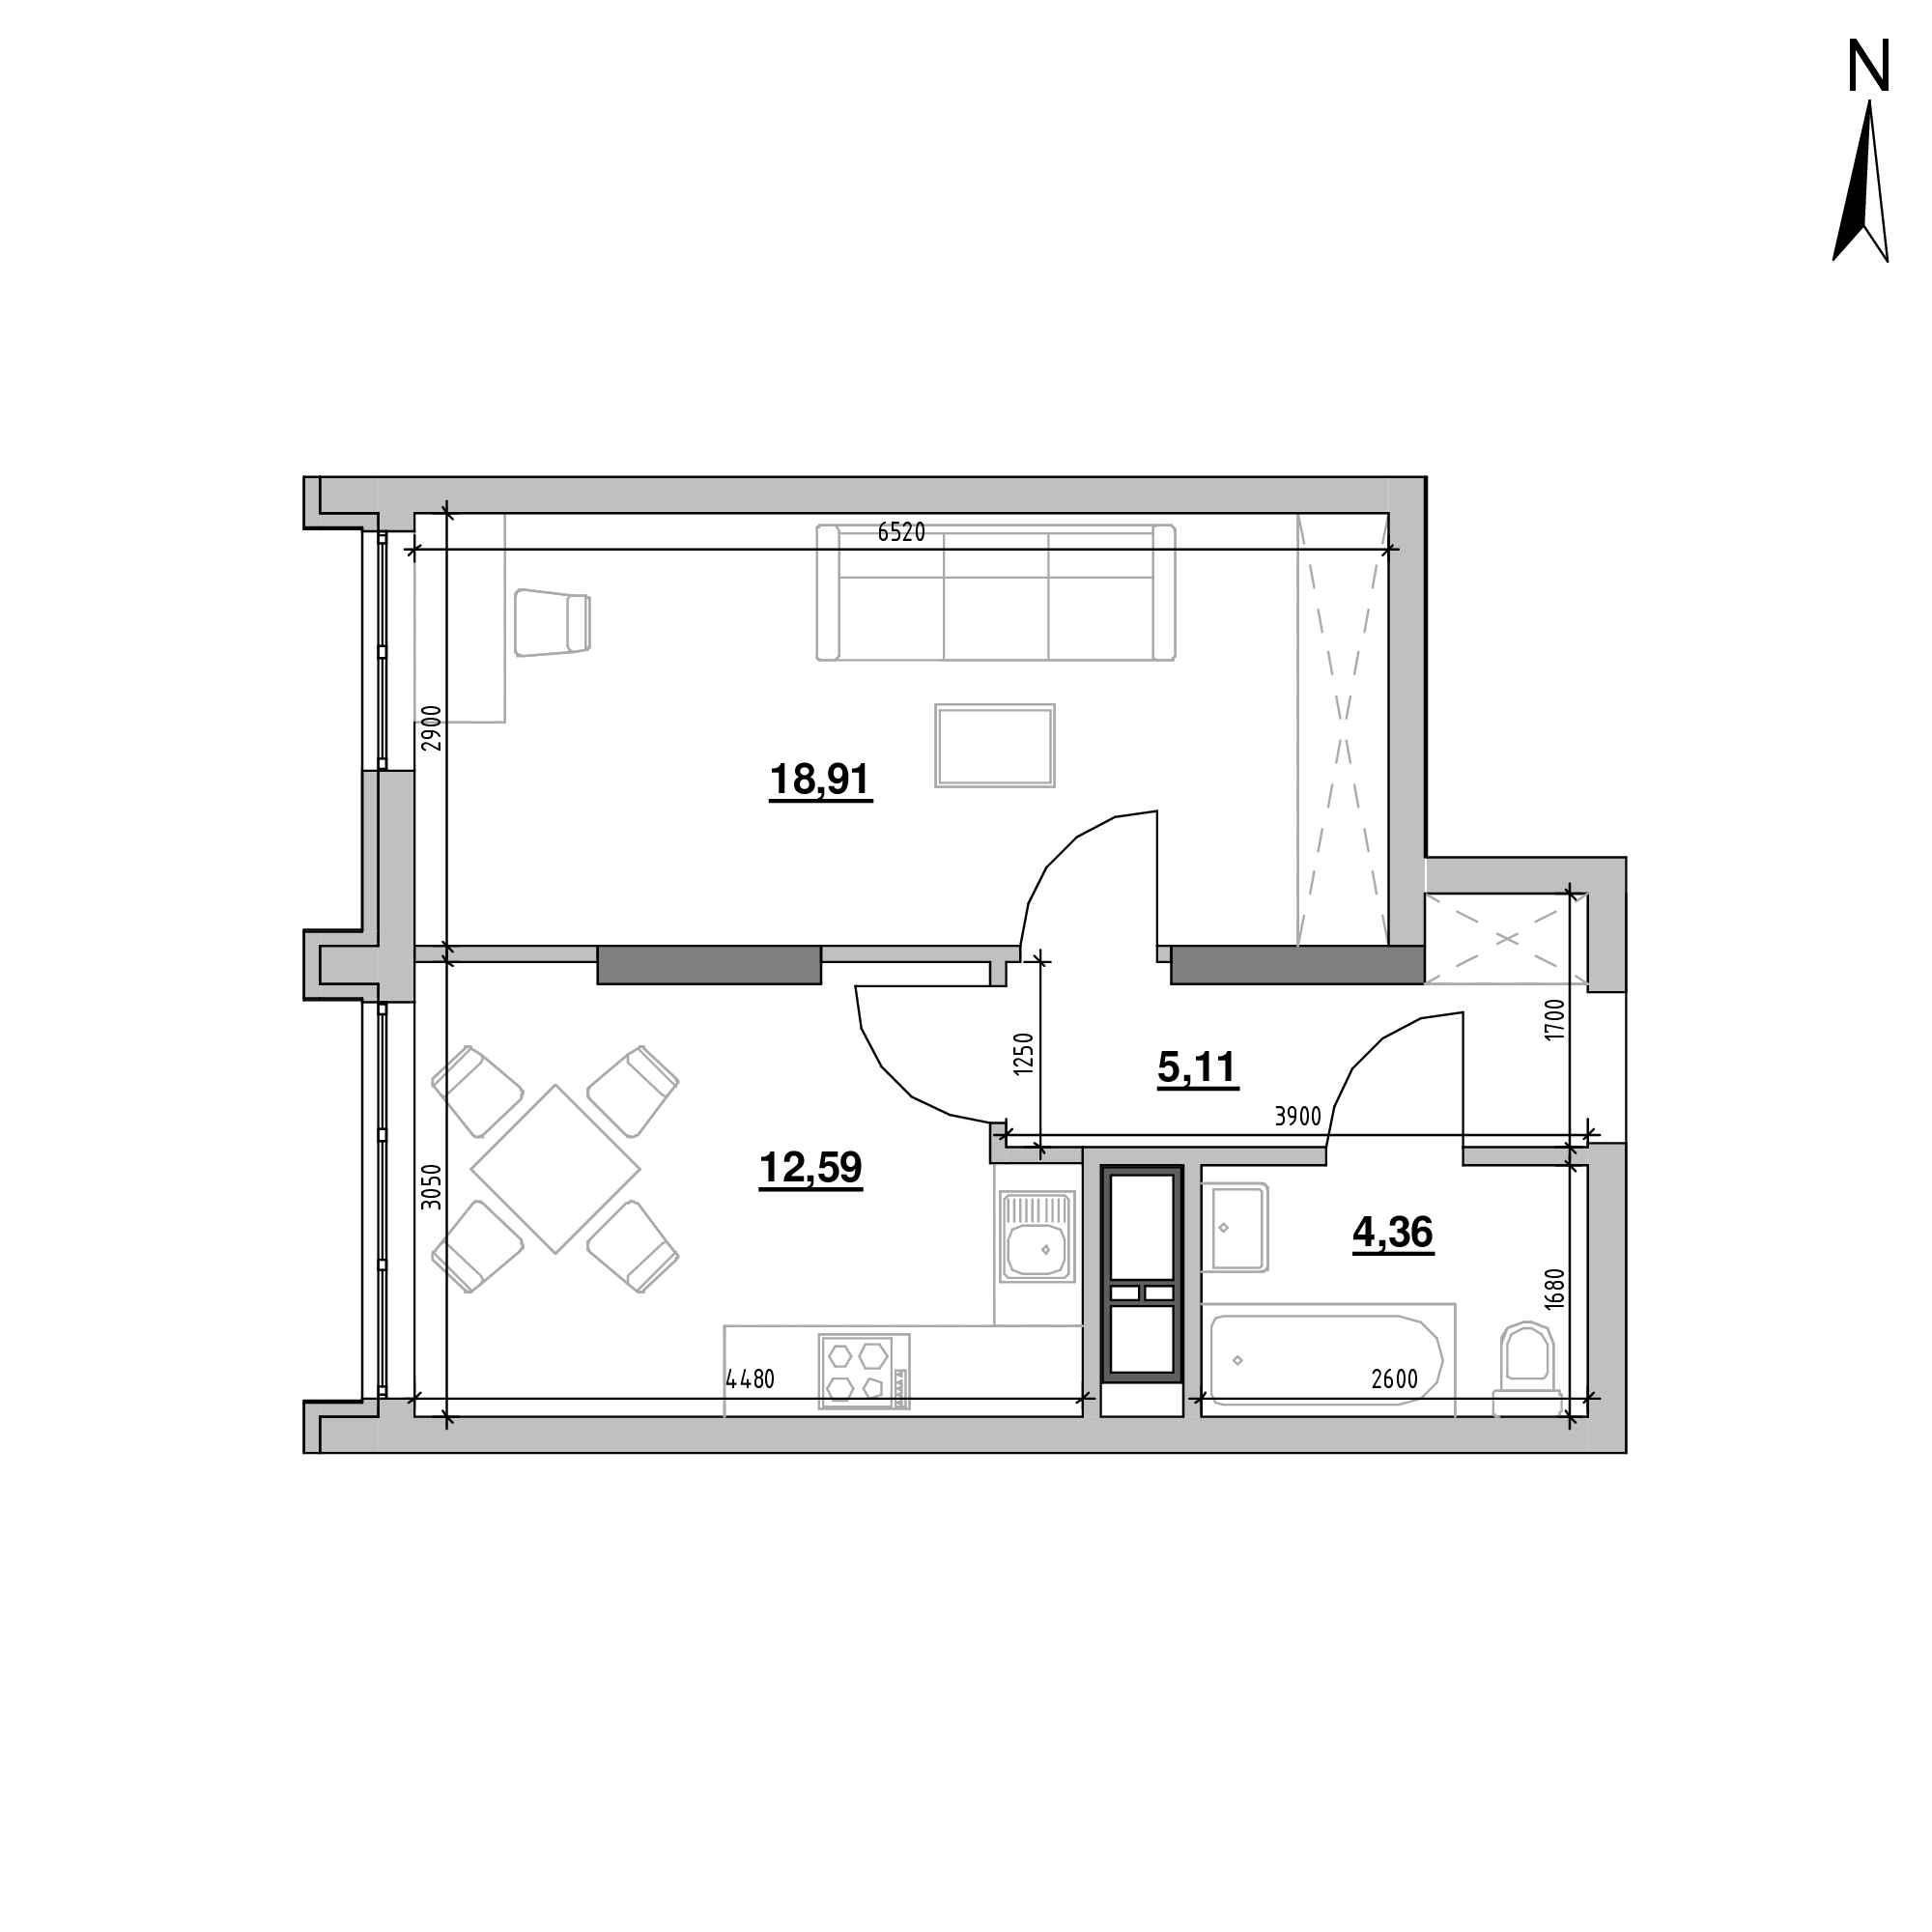 ЖК Nordica Residence: планування 1-кімнатної квартири, №61, 40.97 м<sup>2</sup>